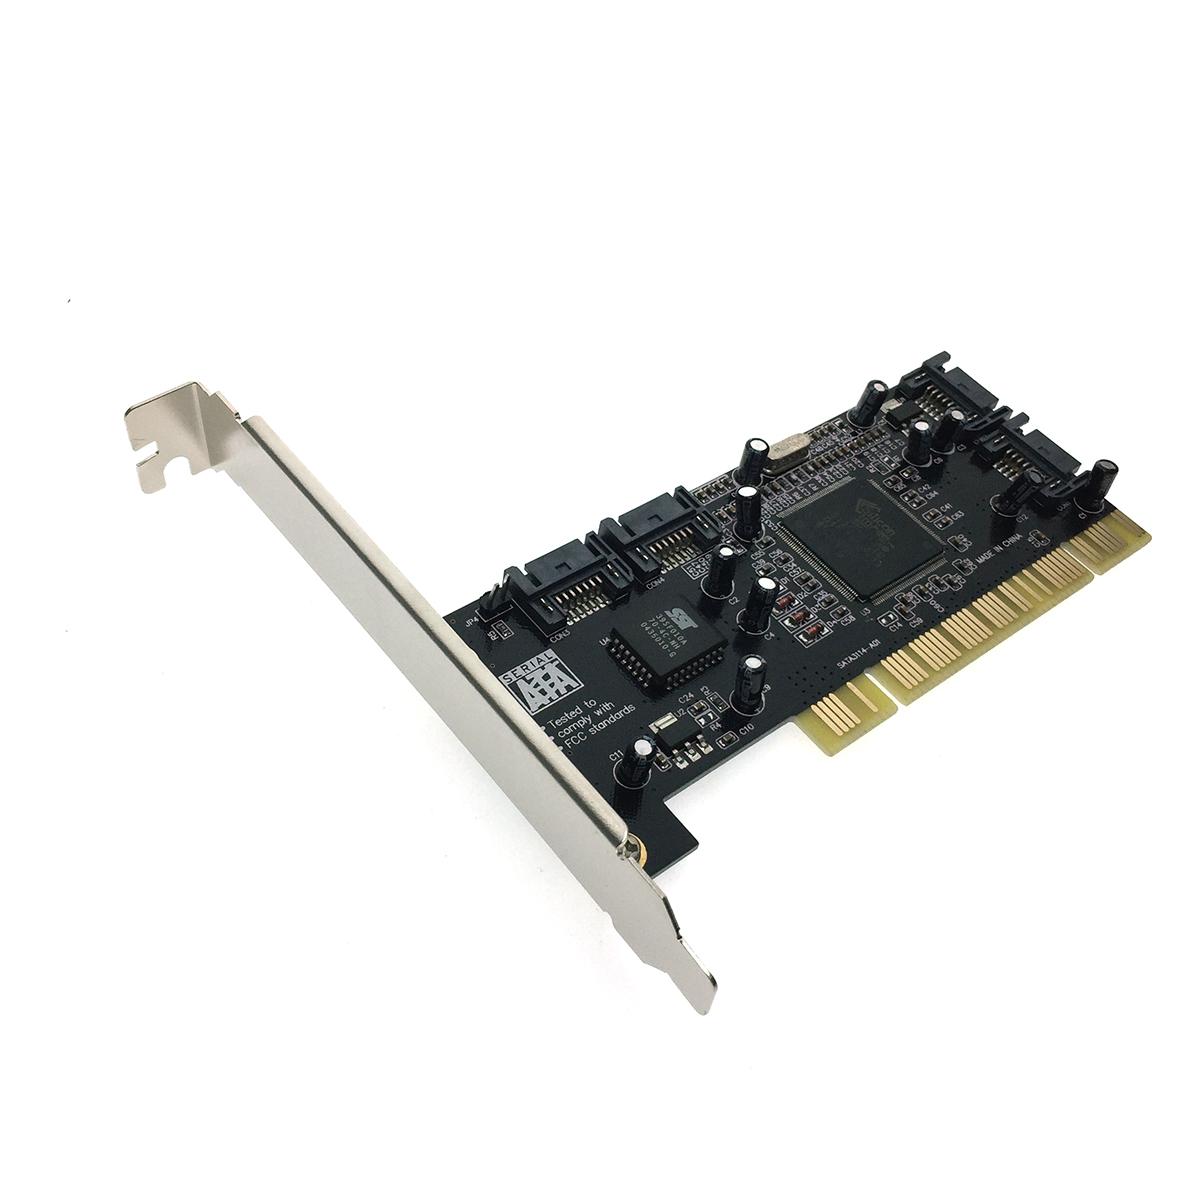 Контроллер PCI to 4 port SATA ,RAID /0, 1, 0+1/, чип Silicon Image Si3114, FG-SA3114-4IR-01-CT01, Espada